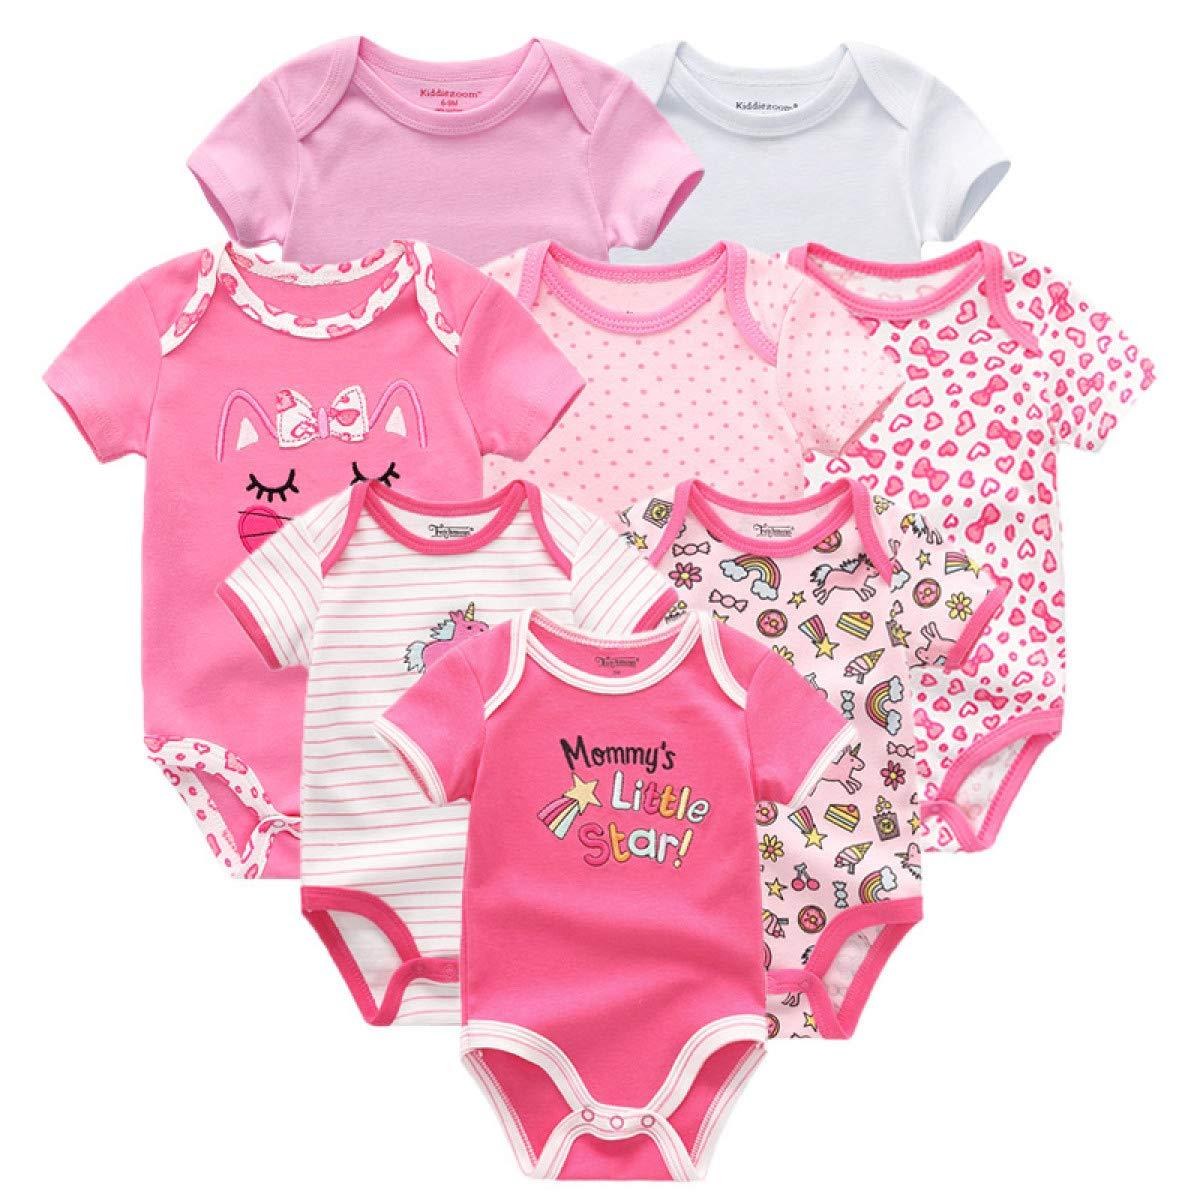 MELLOW SHOP 8PCS//Lot Girls Baby Clothing Bodysuits Baby Girl Clothes Cotton Boys Clothes Short